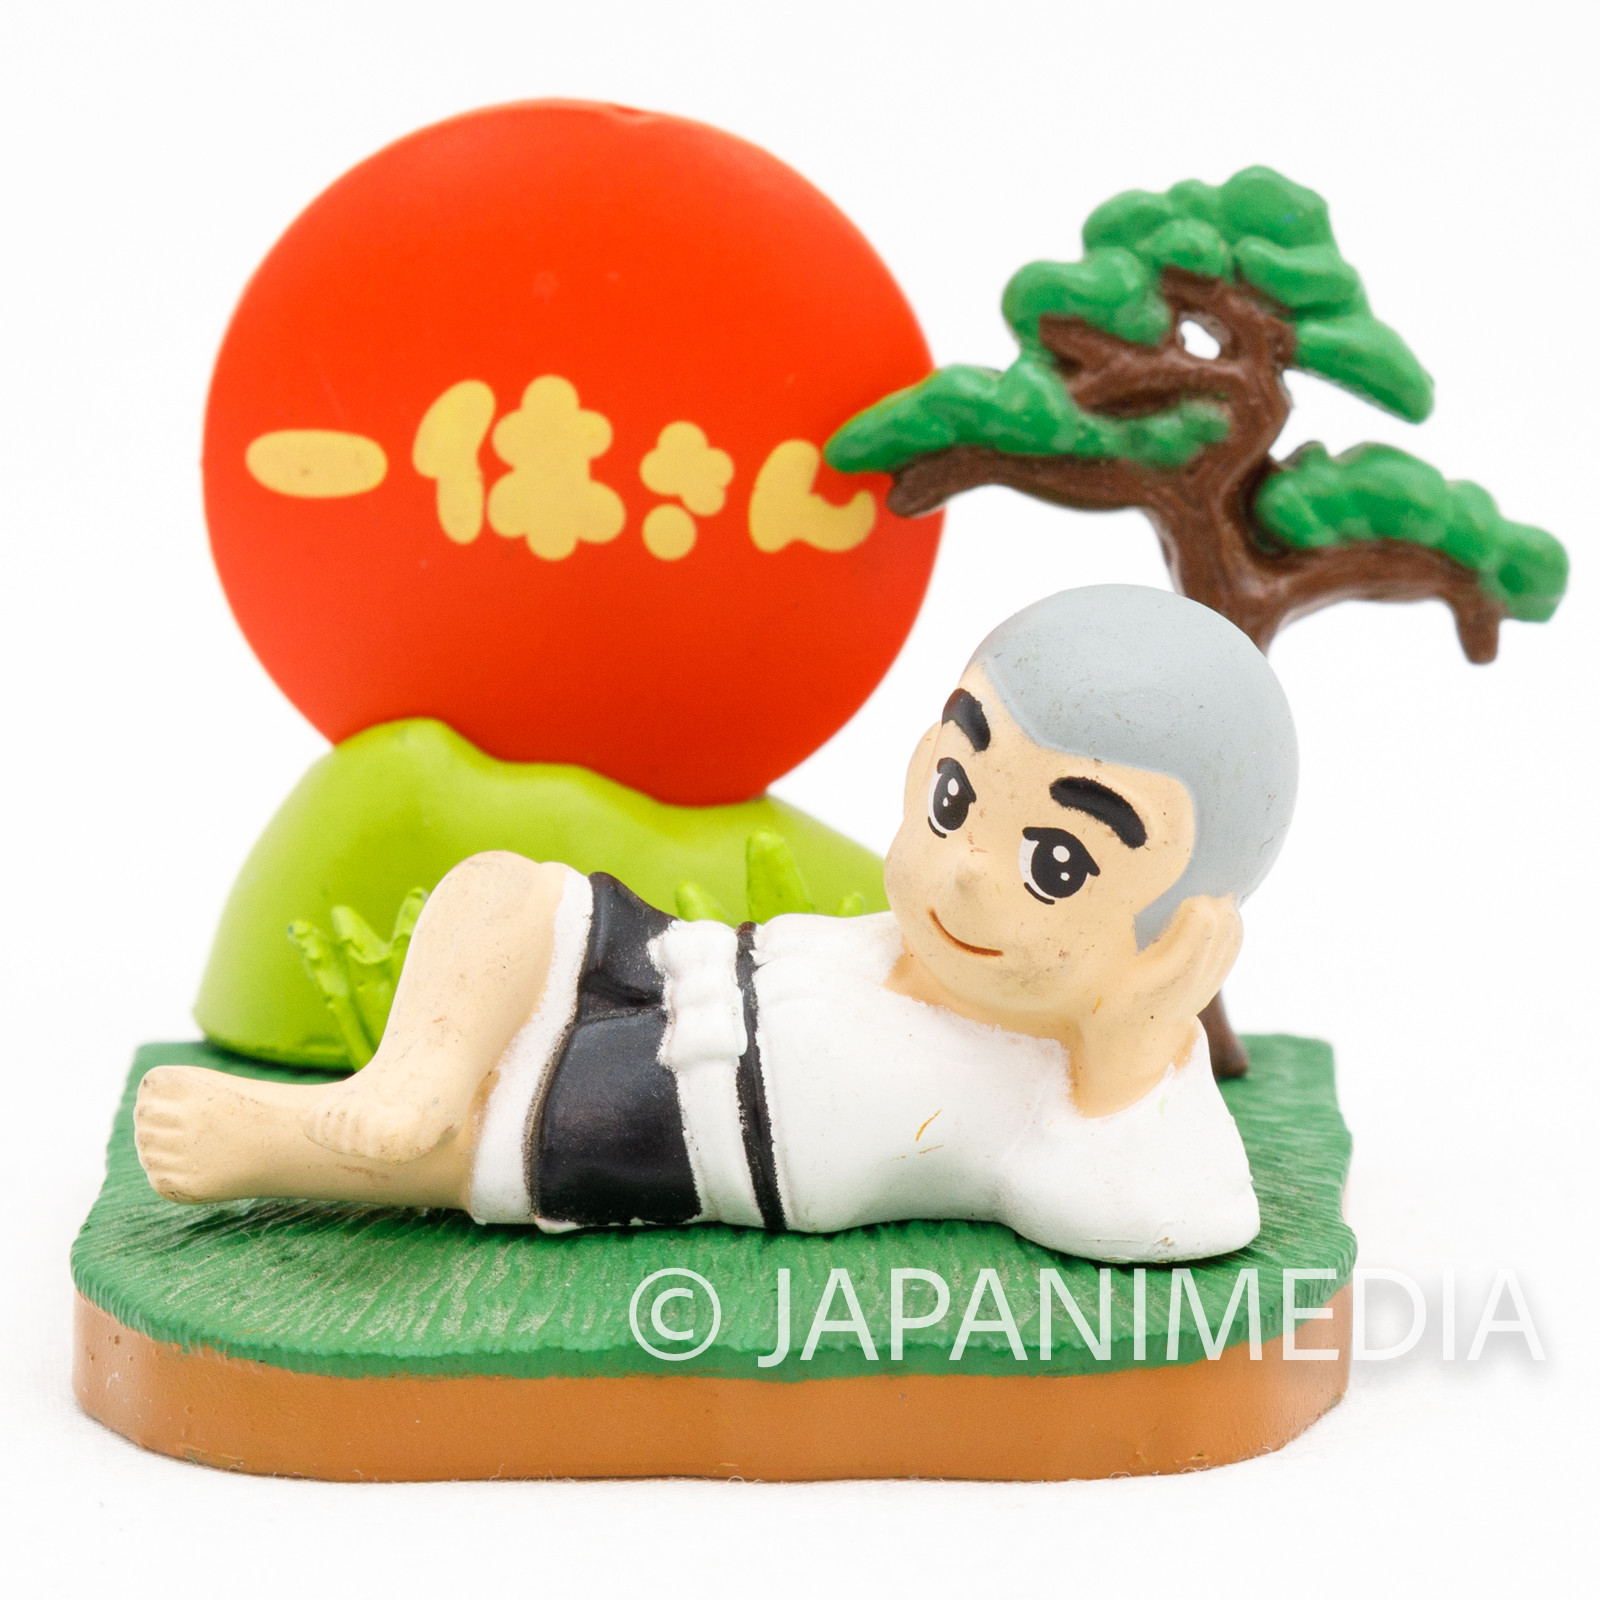 Ikkyu-san Miniature Diorama Figure Taking a break ver. JAPAN ANIME